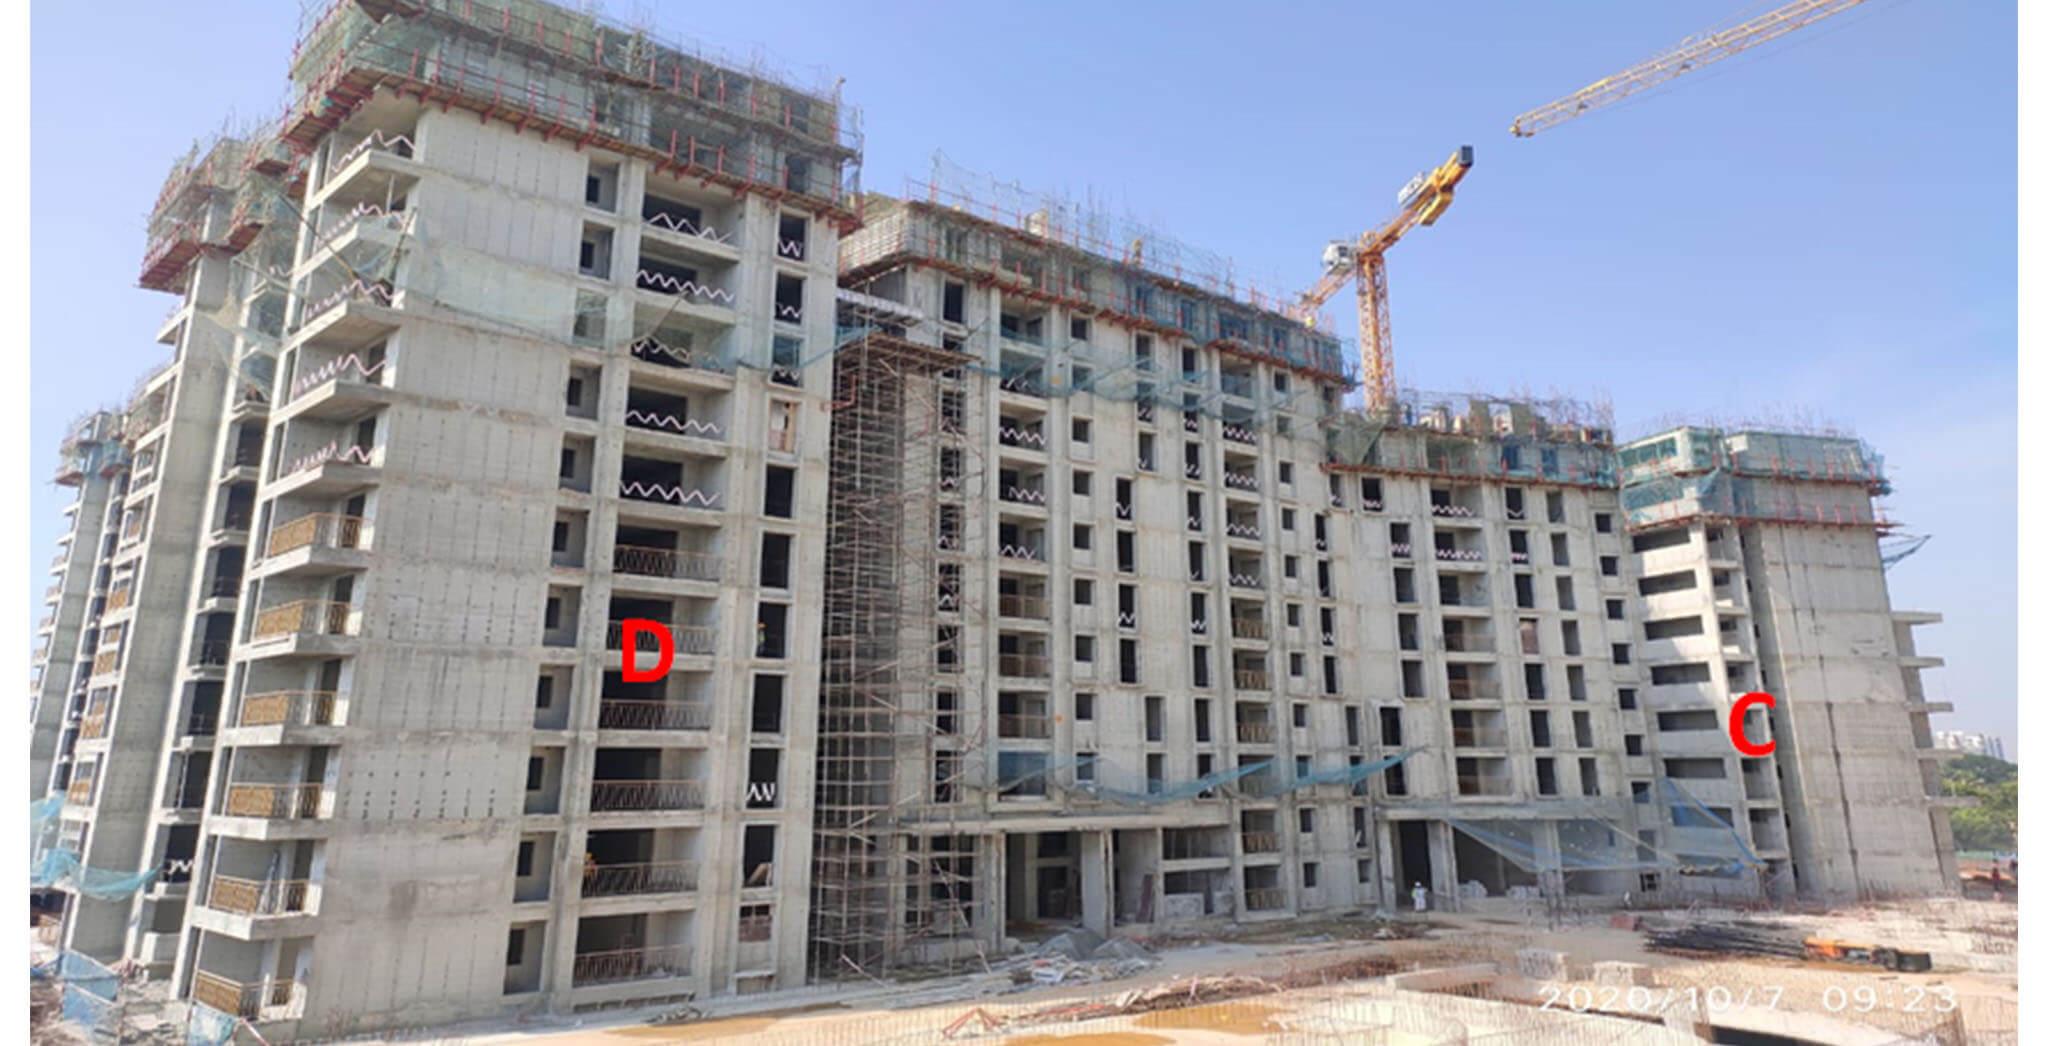 Sep 2020 - Serene: Tower C—10th floor slab structure work completed; Tower D—12th floor slab structure work completed